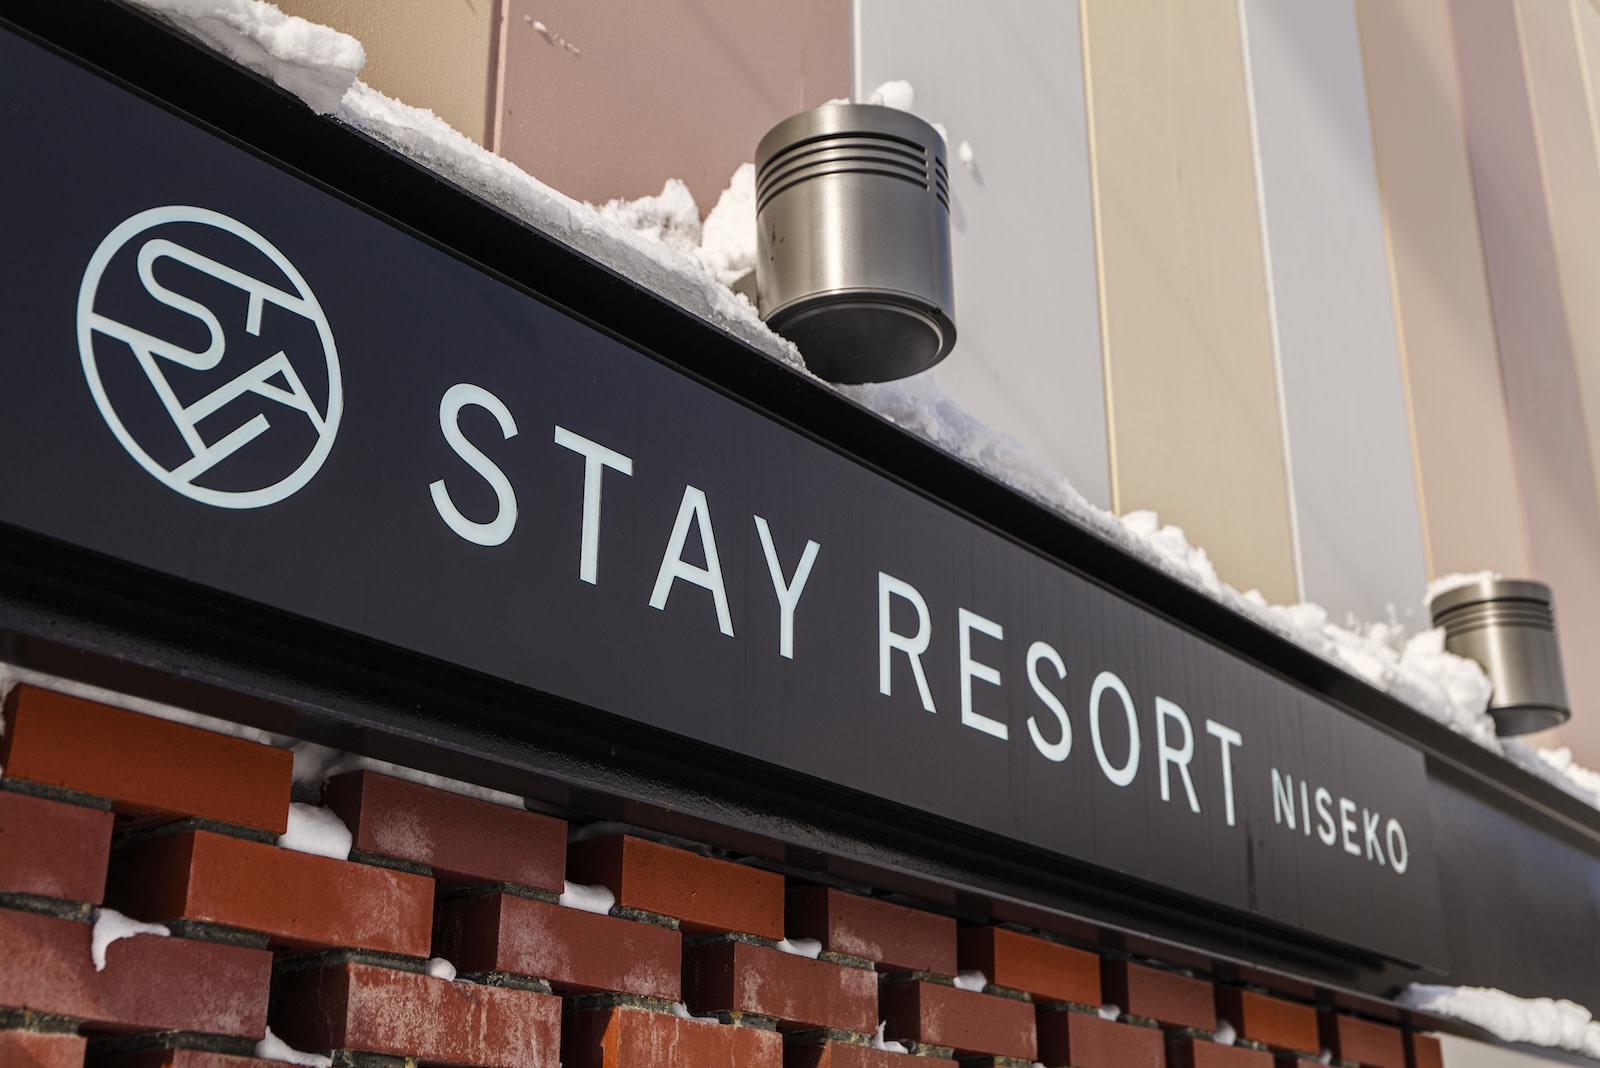 STAY RESORT 002 | Workations(ワーケーションズ)